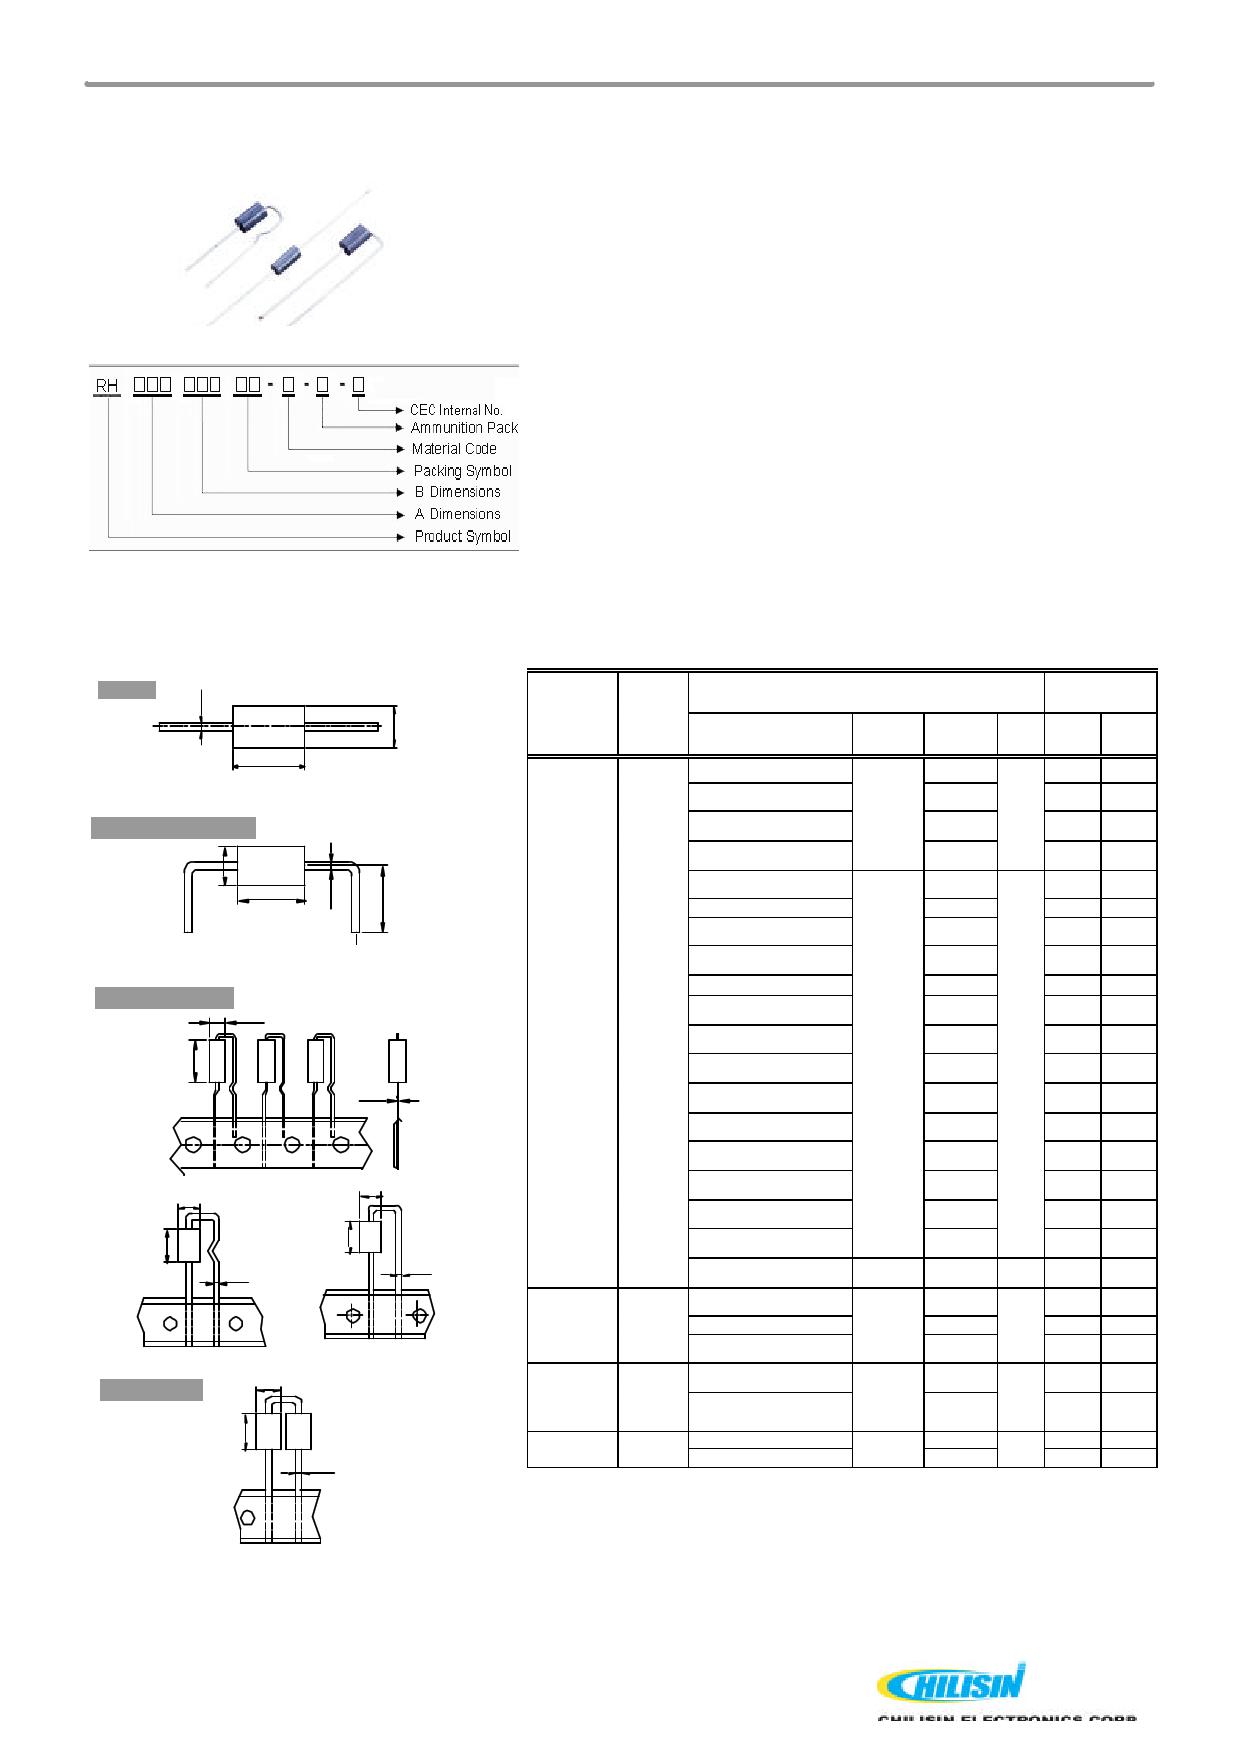 RH03509 데이터시트 및 RH03509 PDF